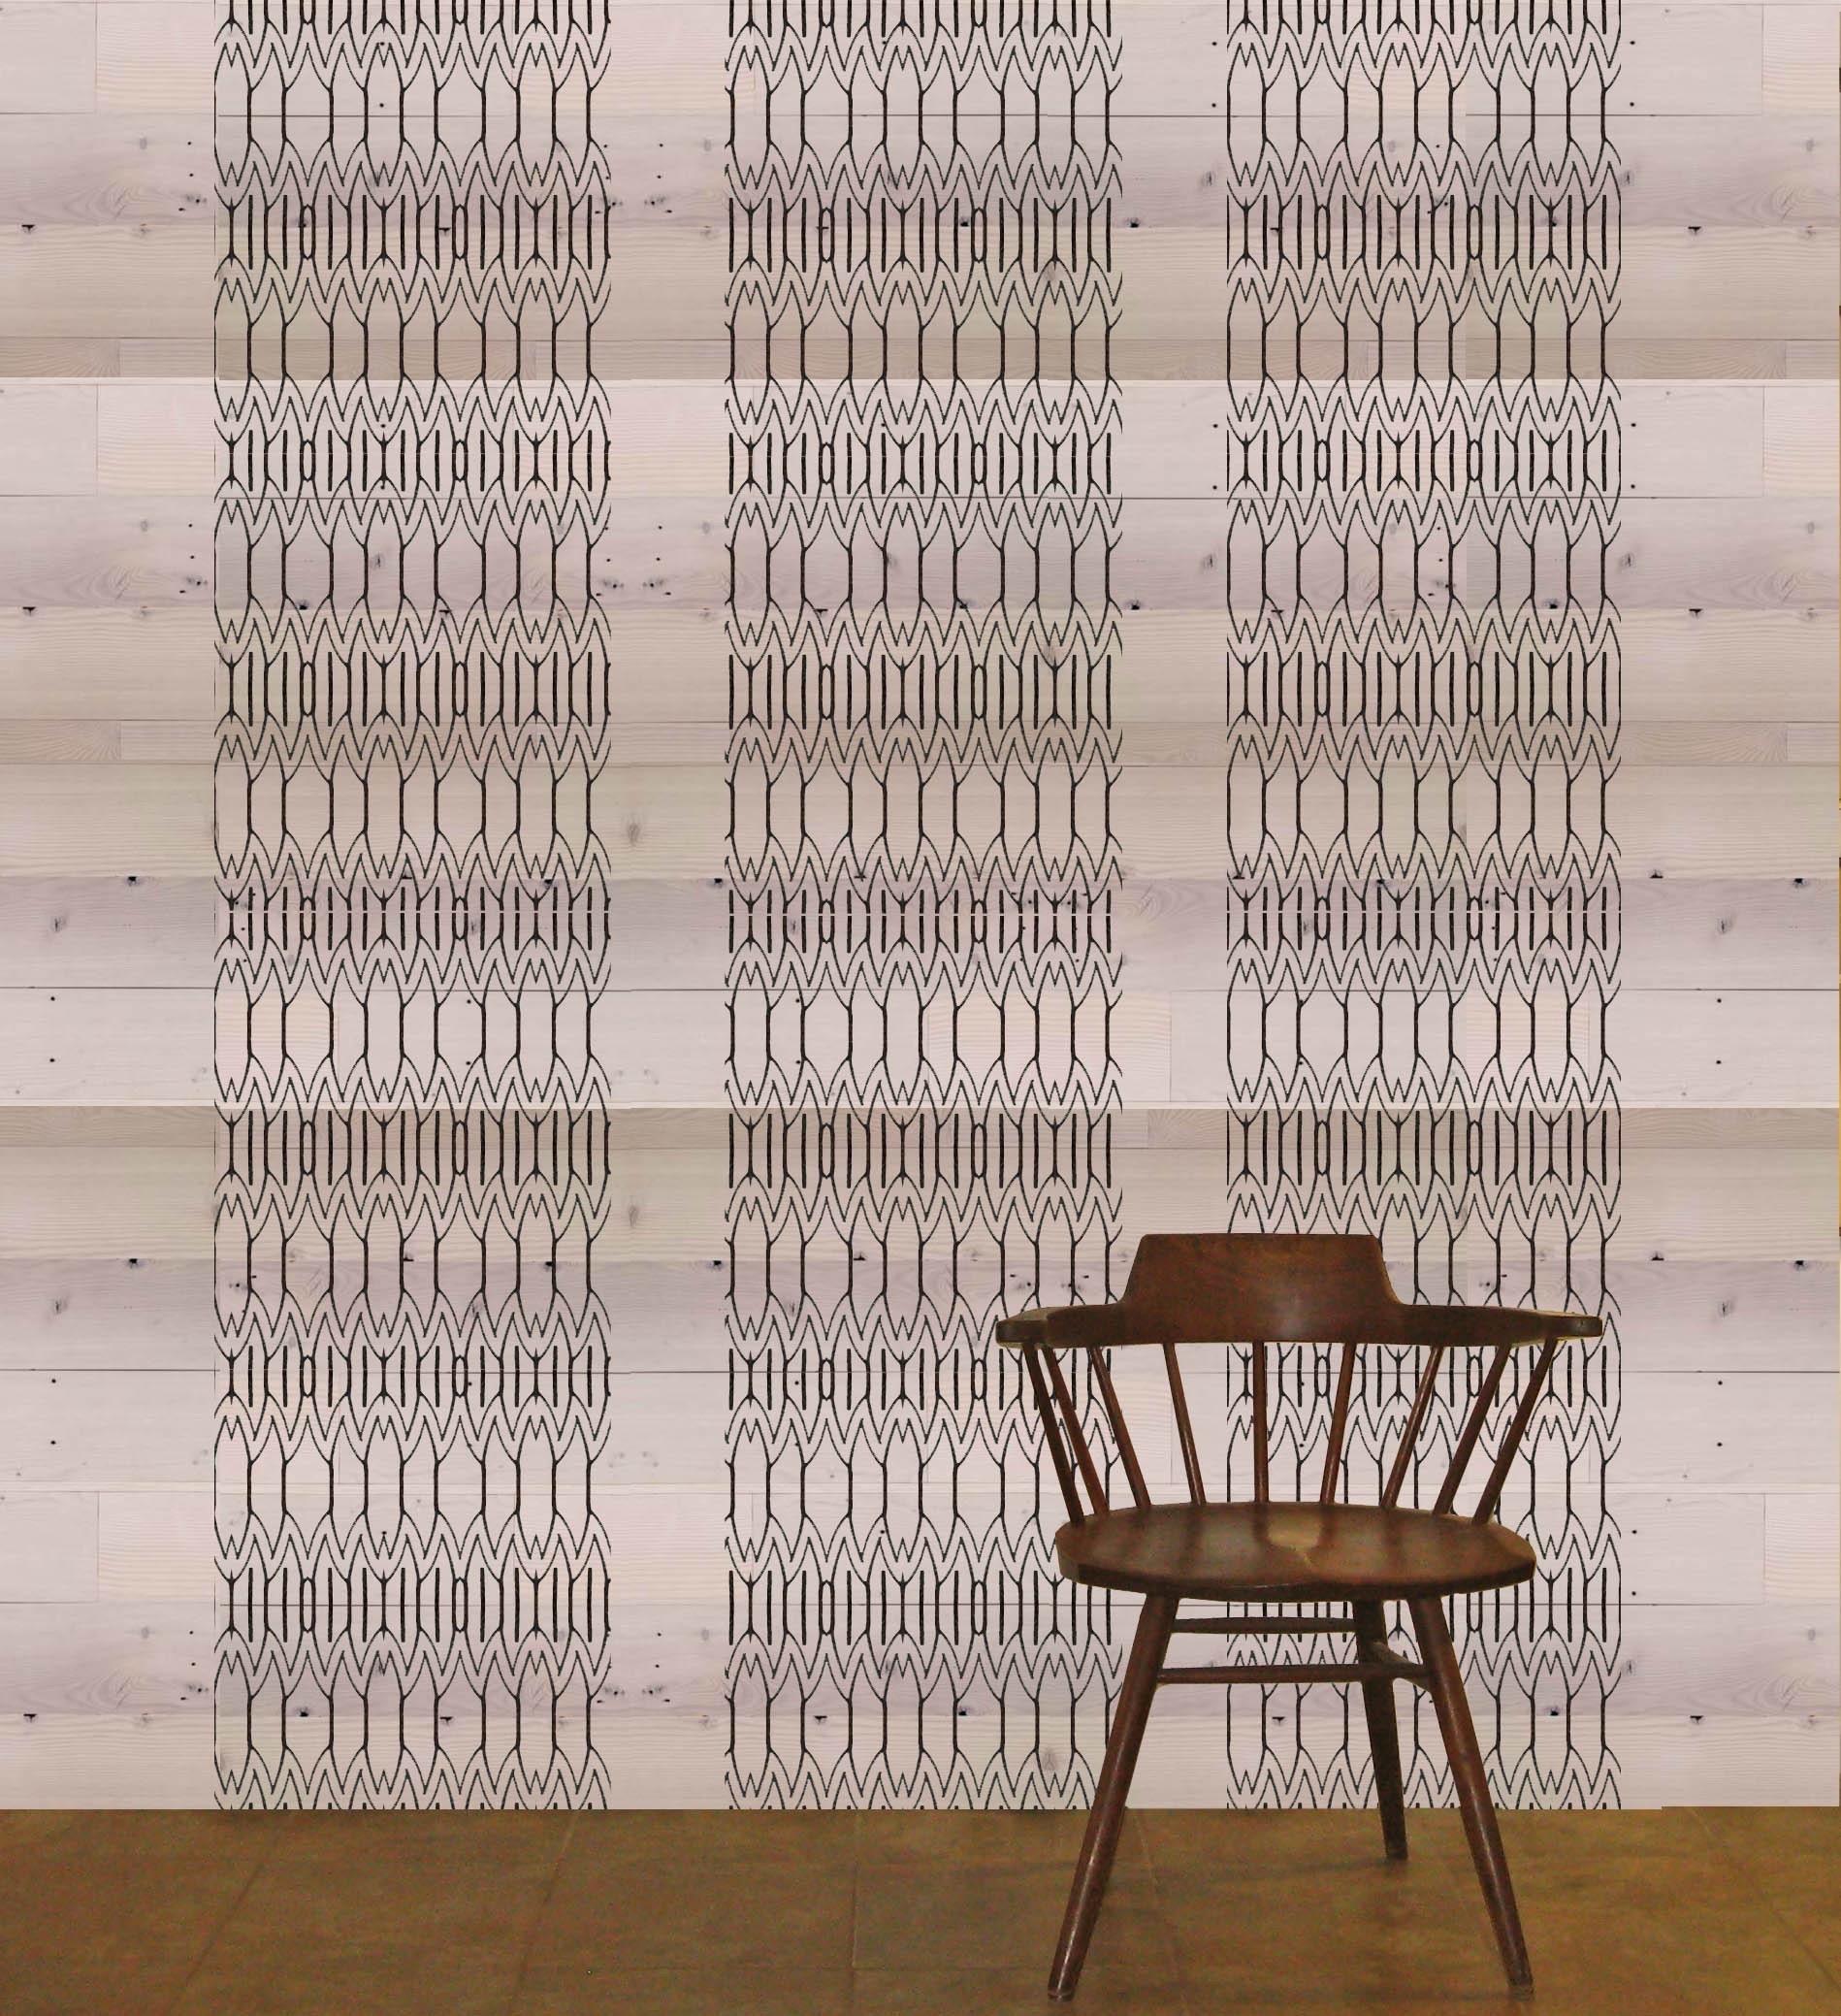 Yposts 2 chair.jpg